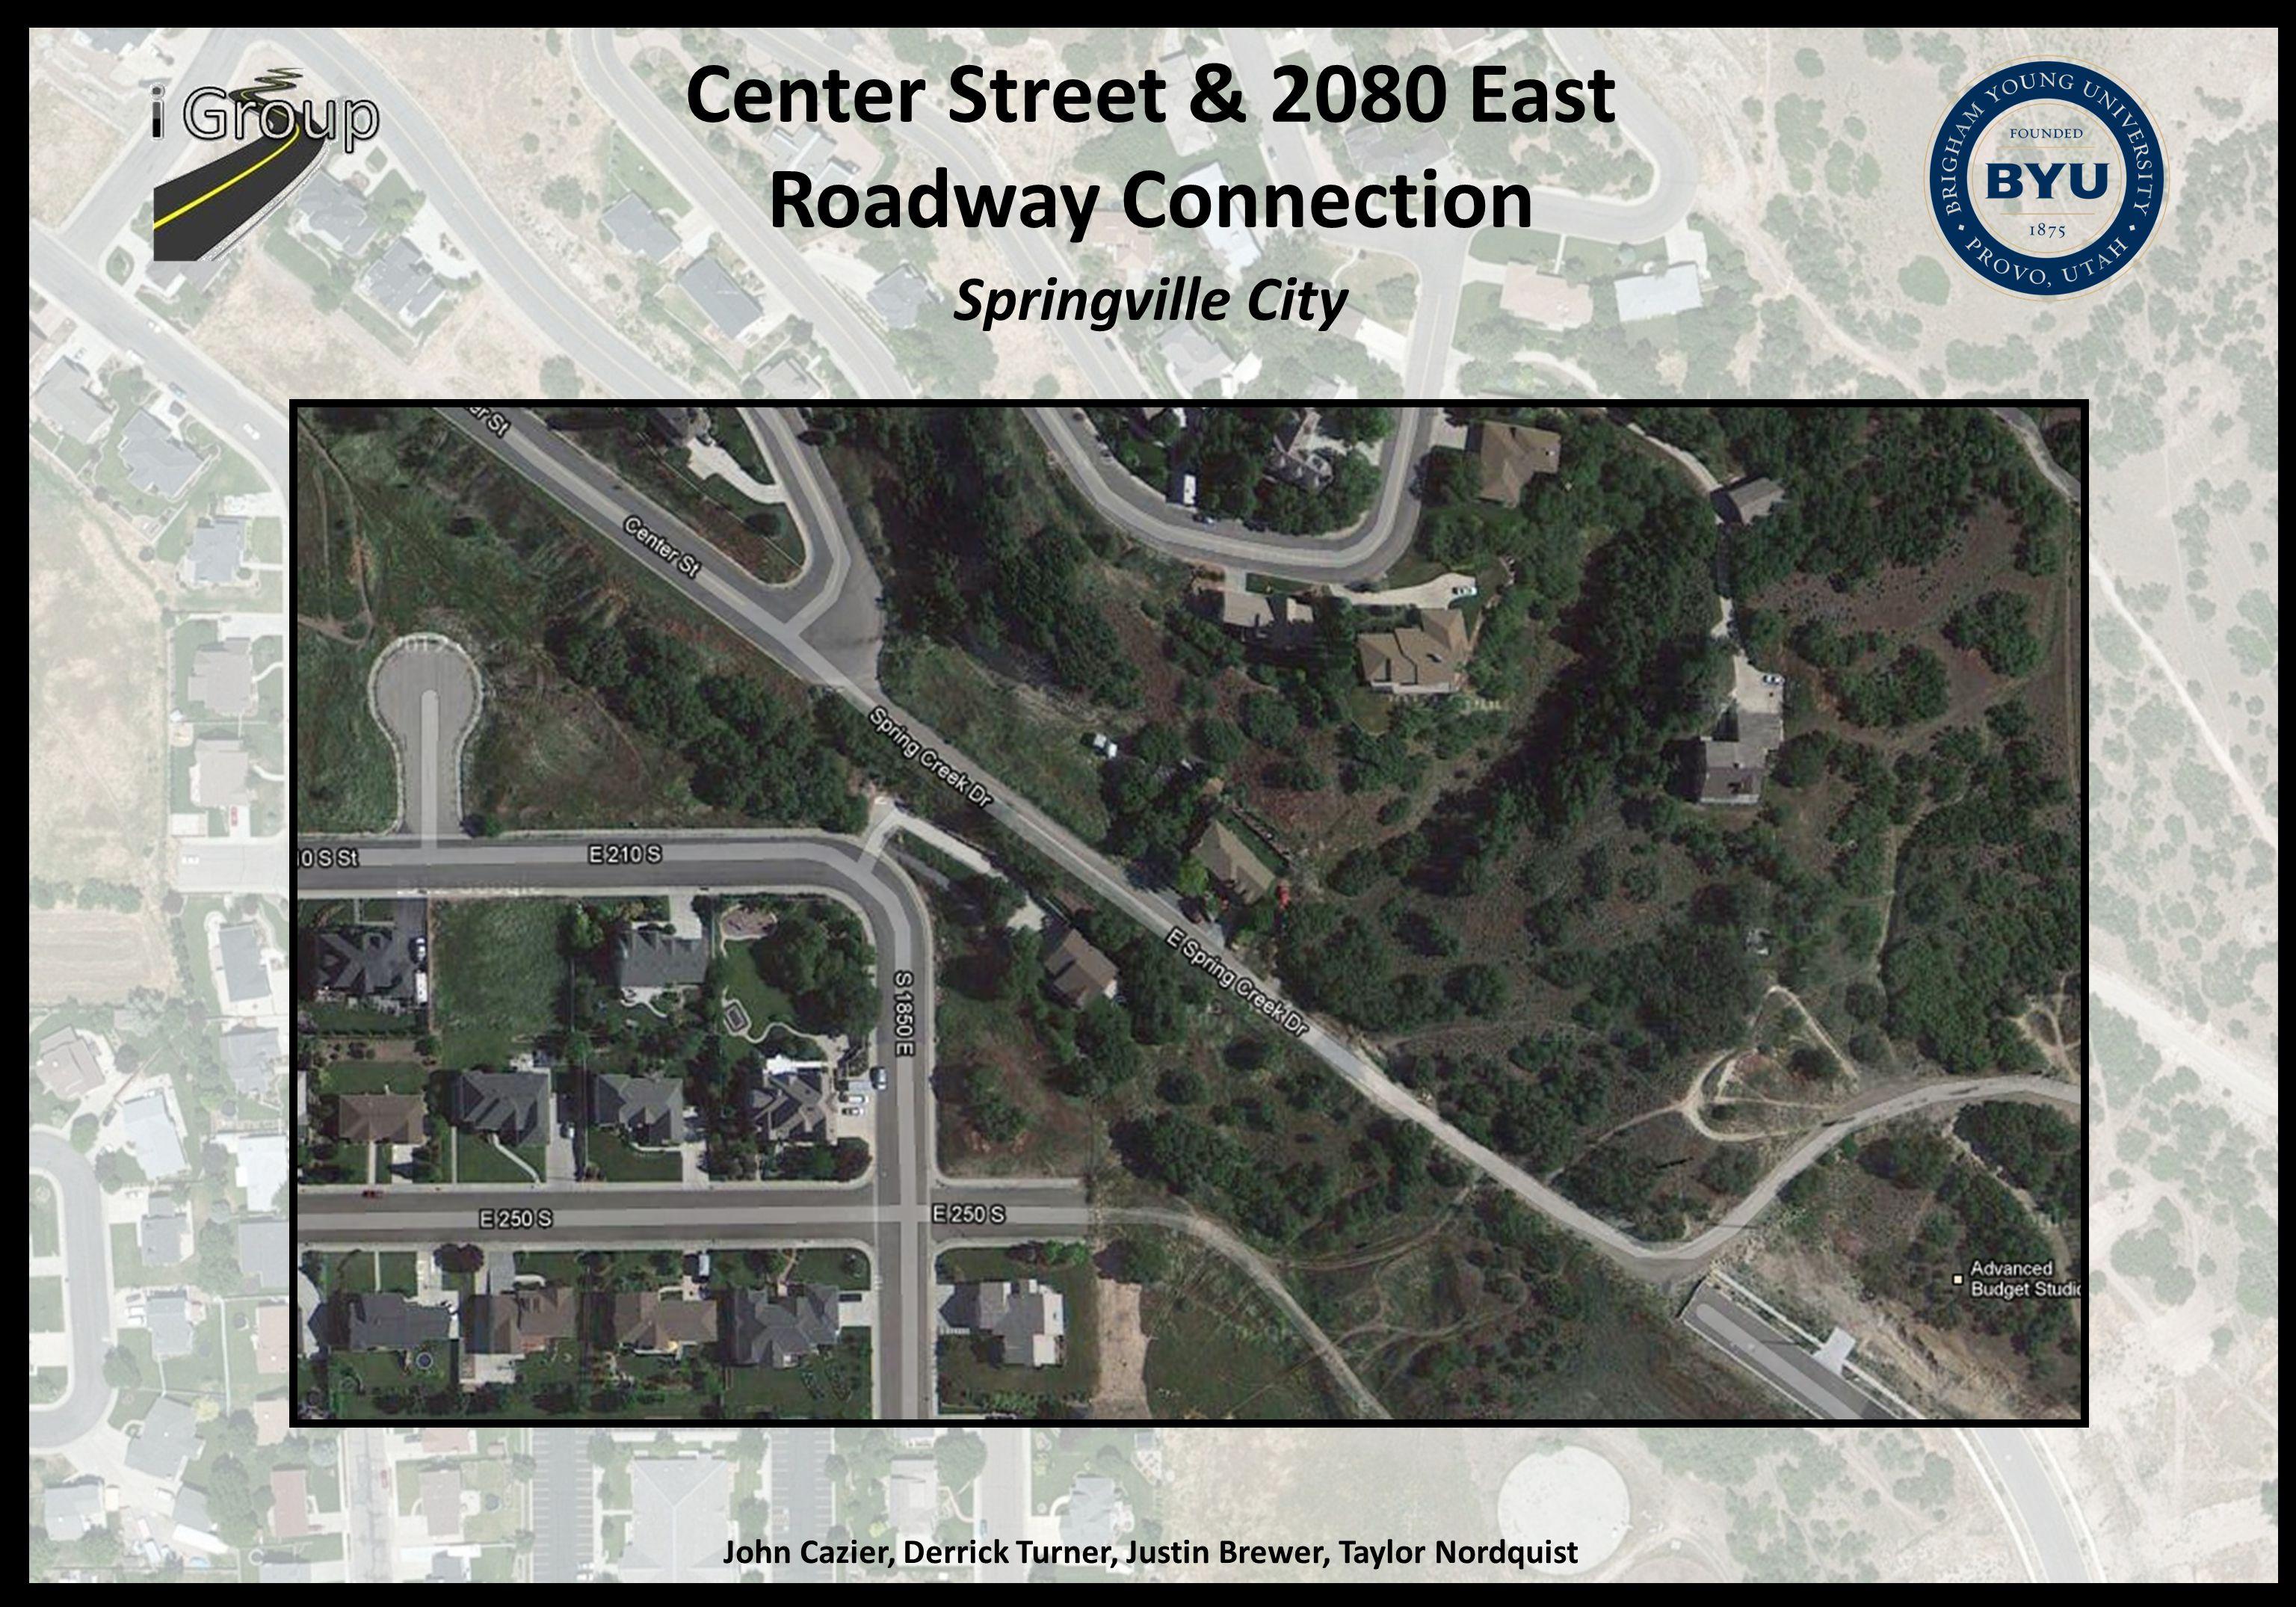 Center Street & 2080 East Roadway Connection Springville City John Cazier, Derrick Turner, Justin Brewer, Taylor Nordquist